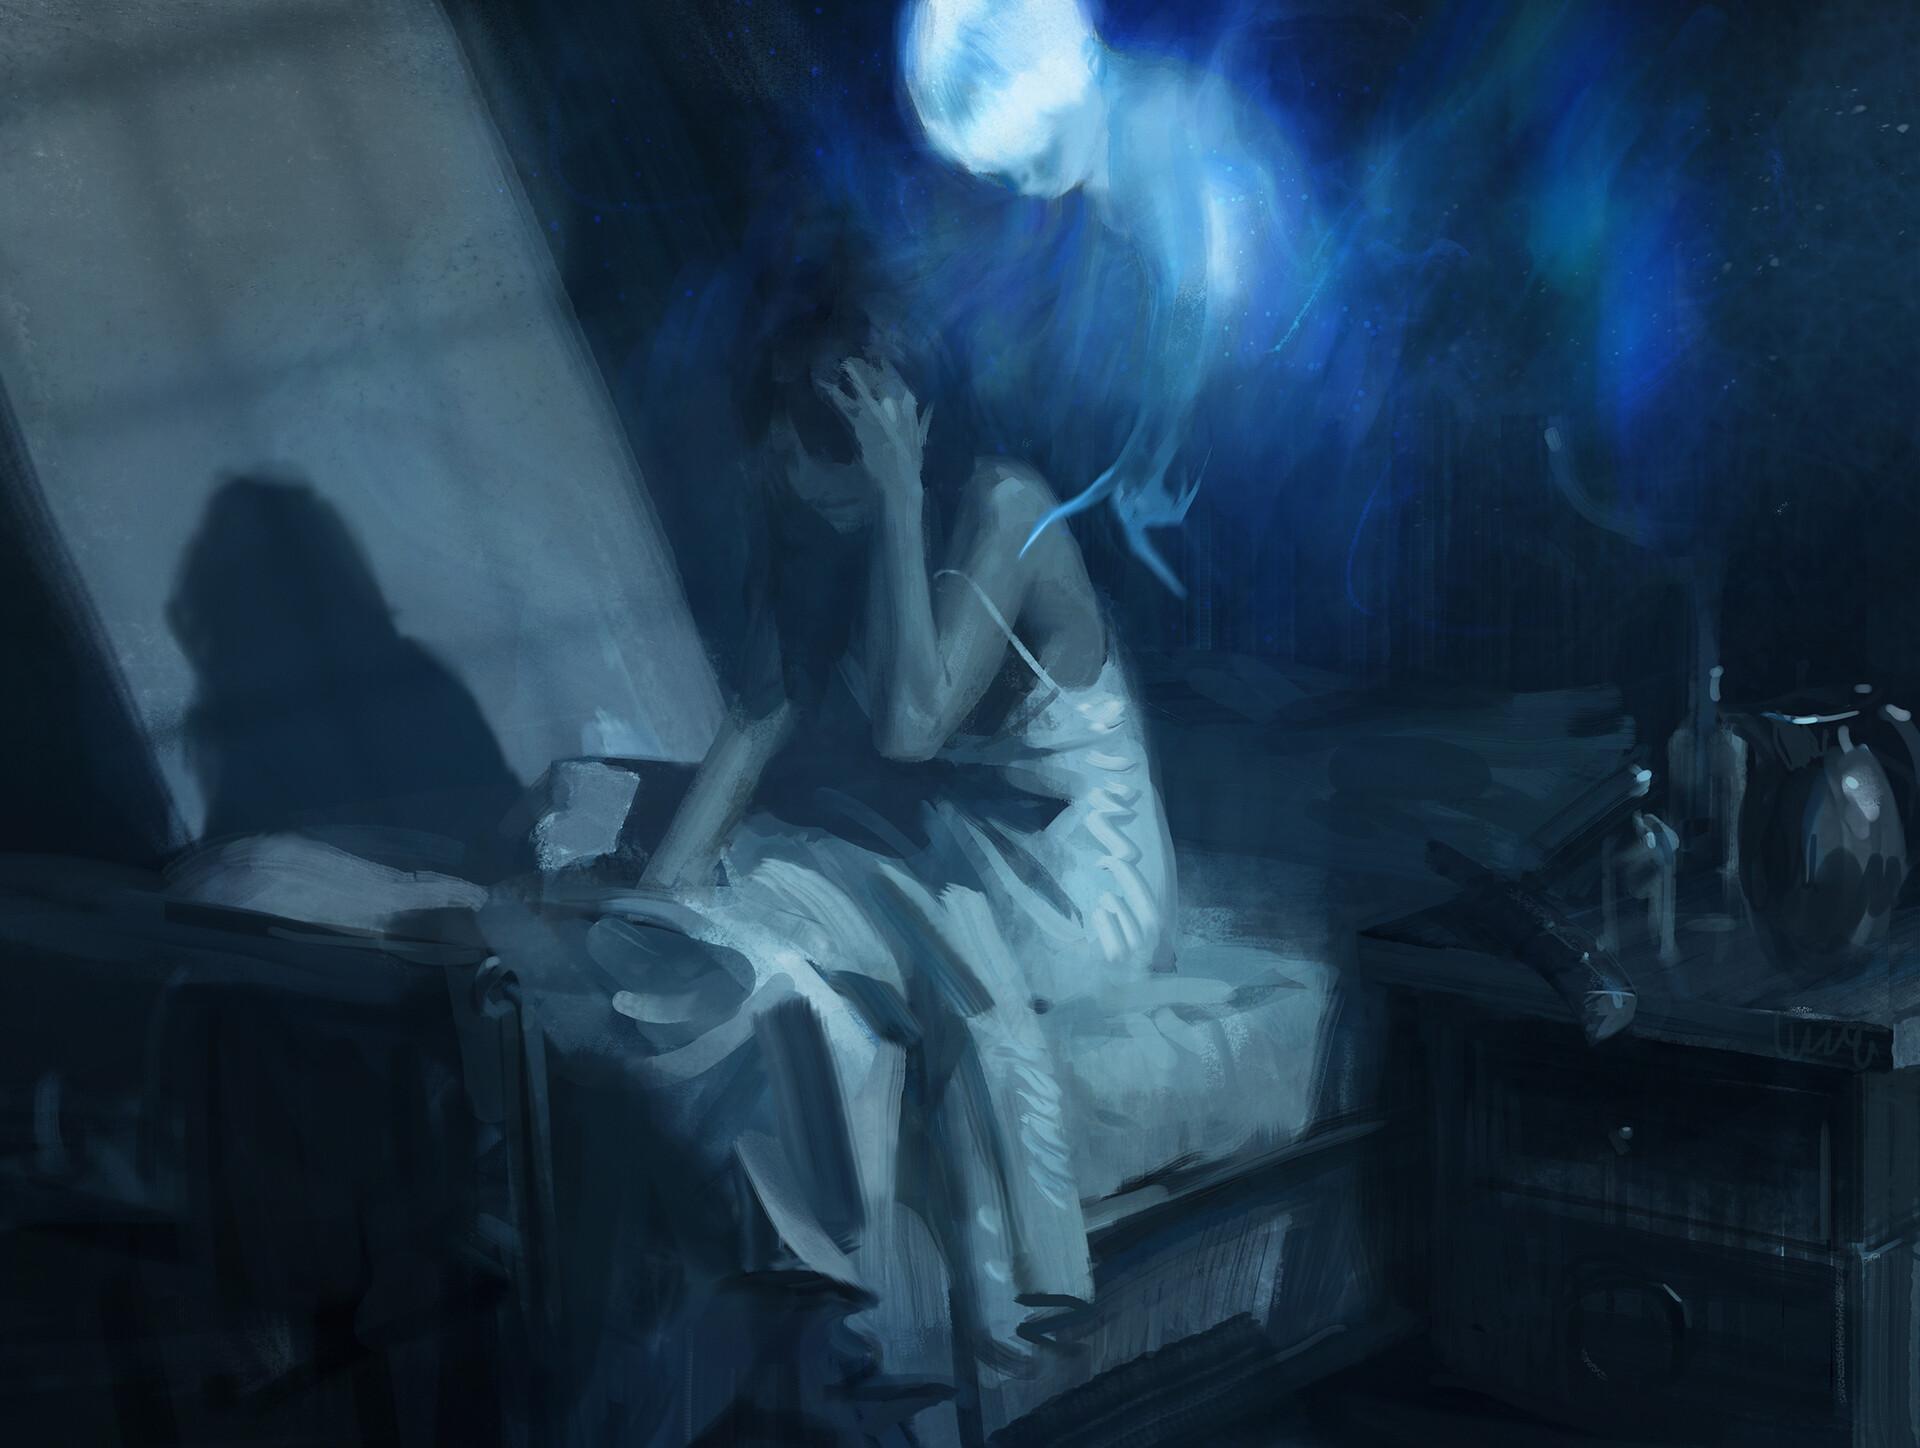 Startled Awake   Illustration by Sean Sevestre